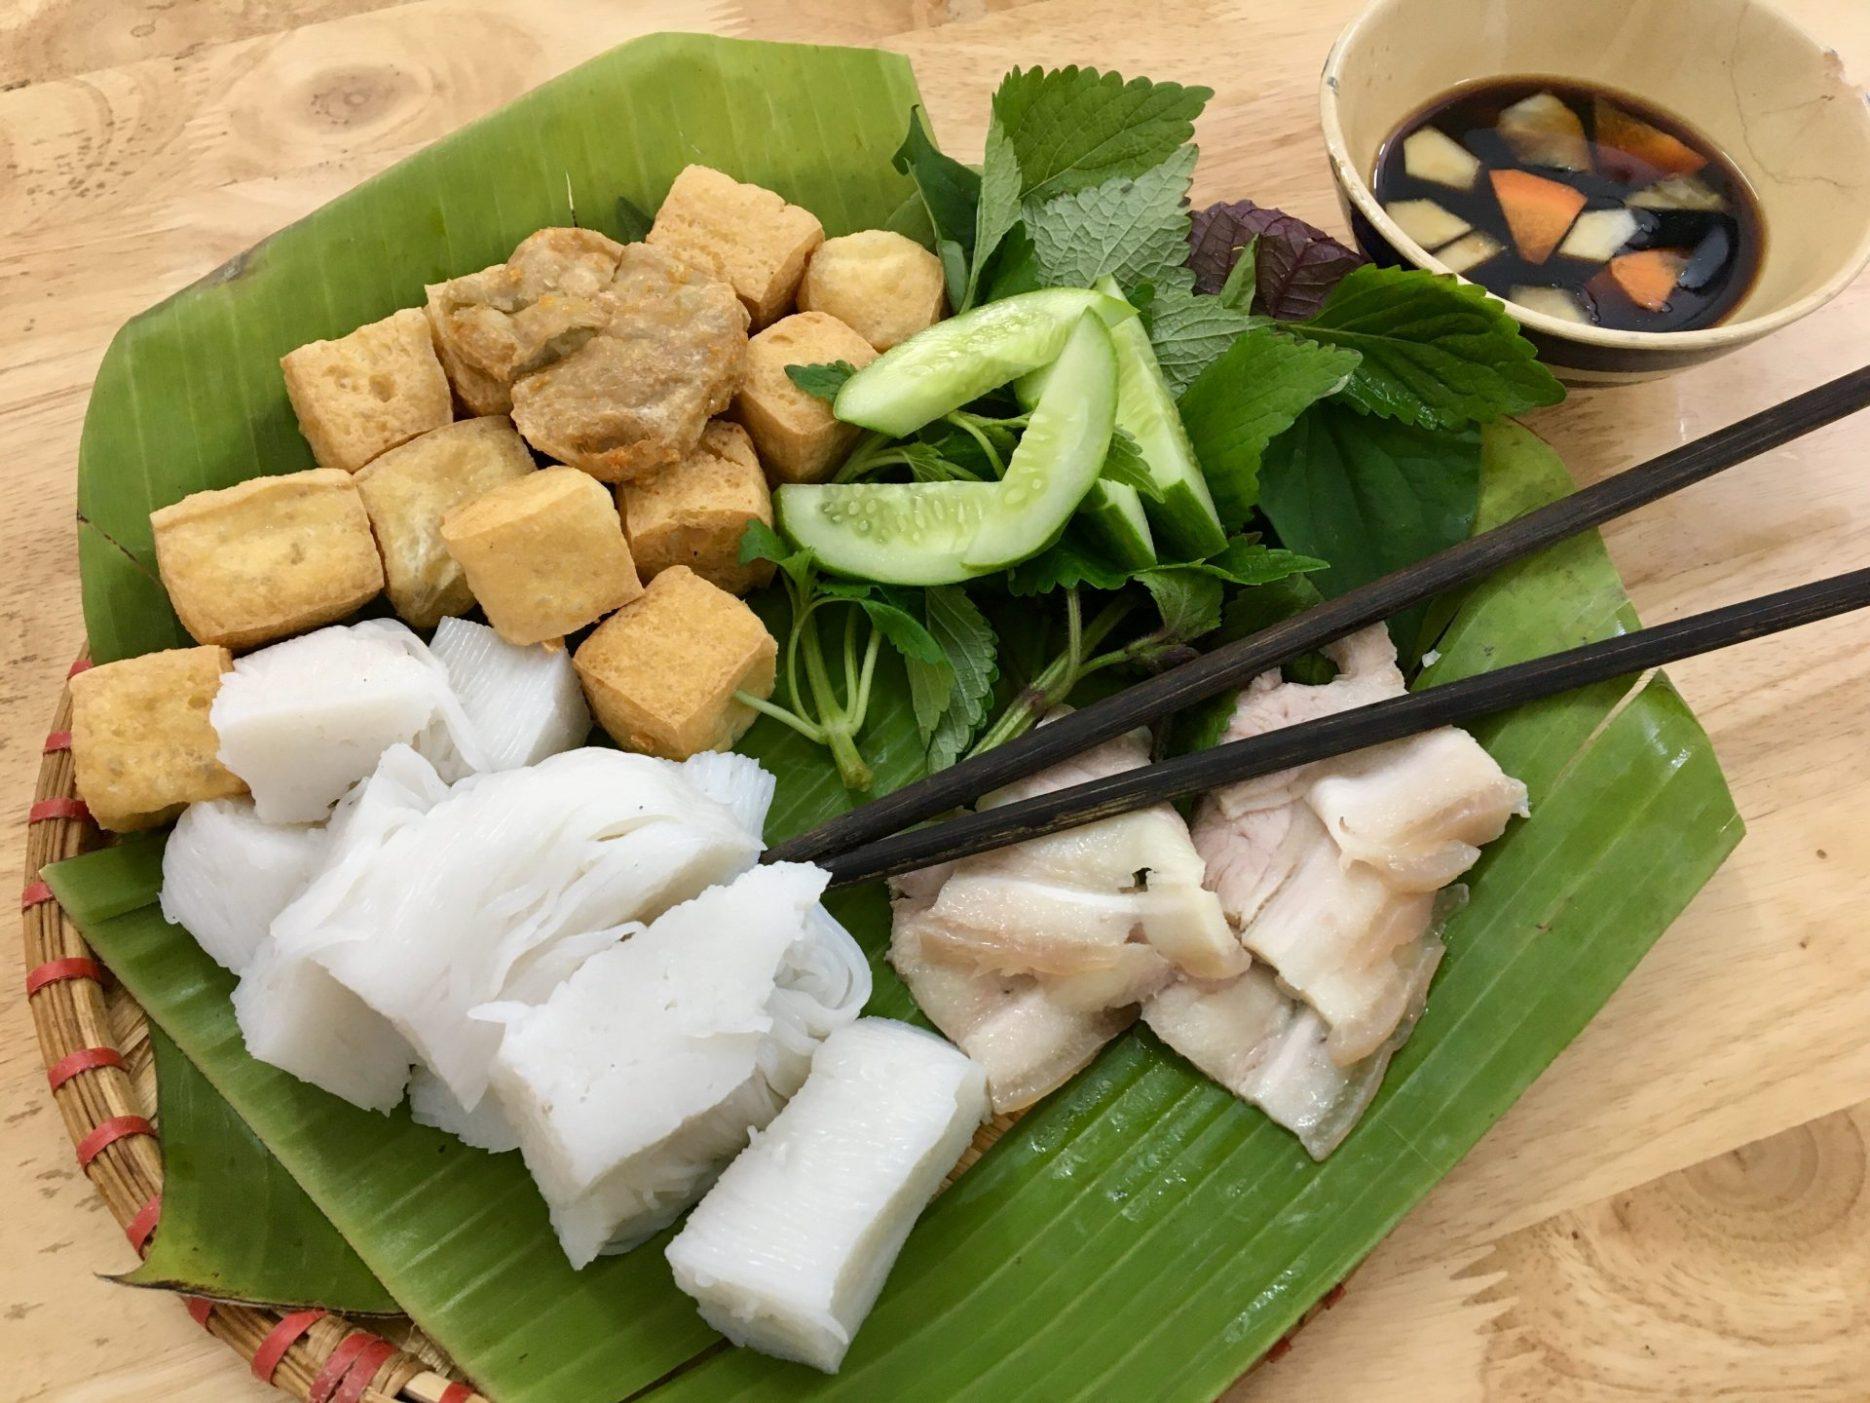 Bún Đậu Mắm Tôm - Rice Vermicelli Noodle with Fried Tofu and Shrimp Paste